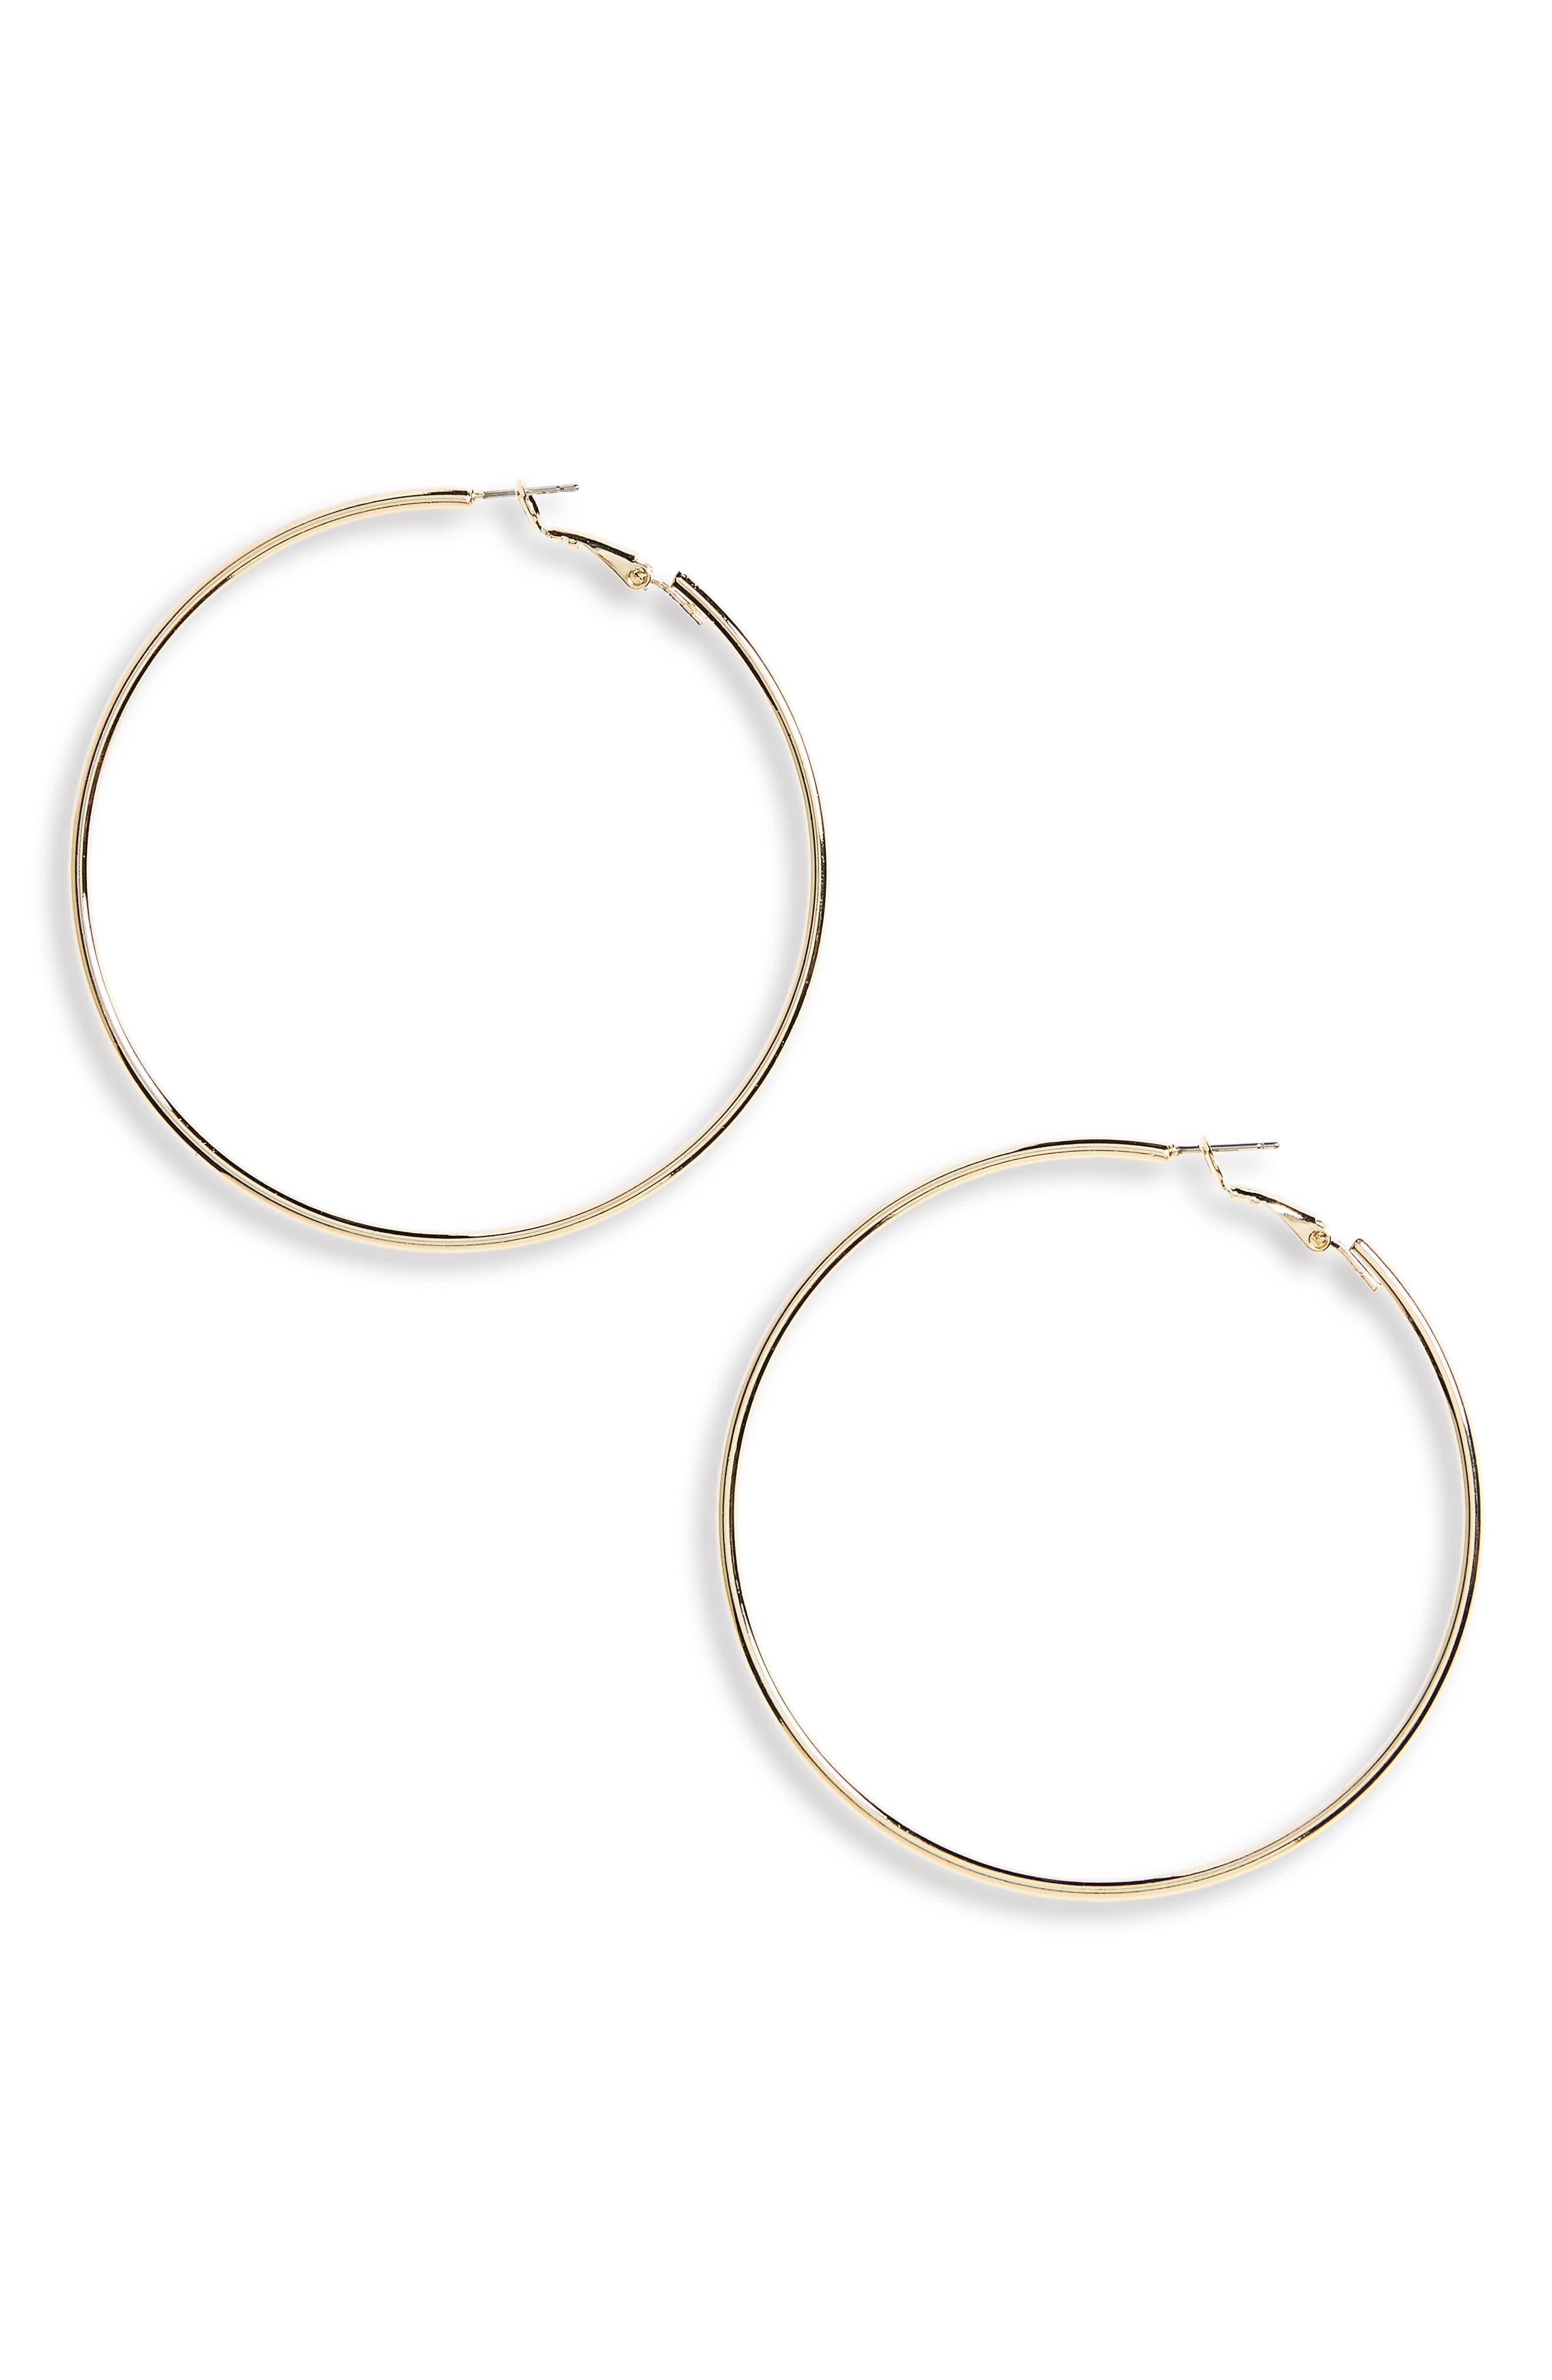 Gold Hoop Earrings,                         Main,                         color, Gold